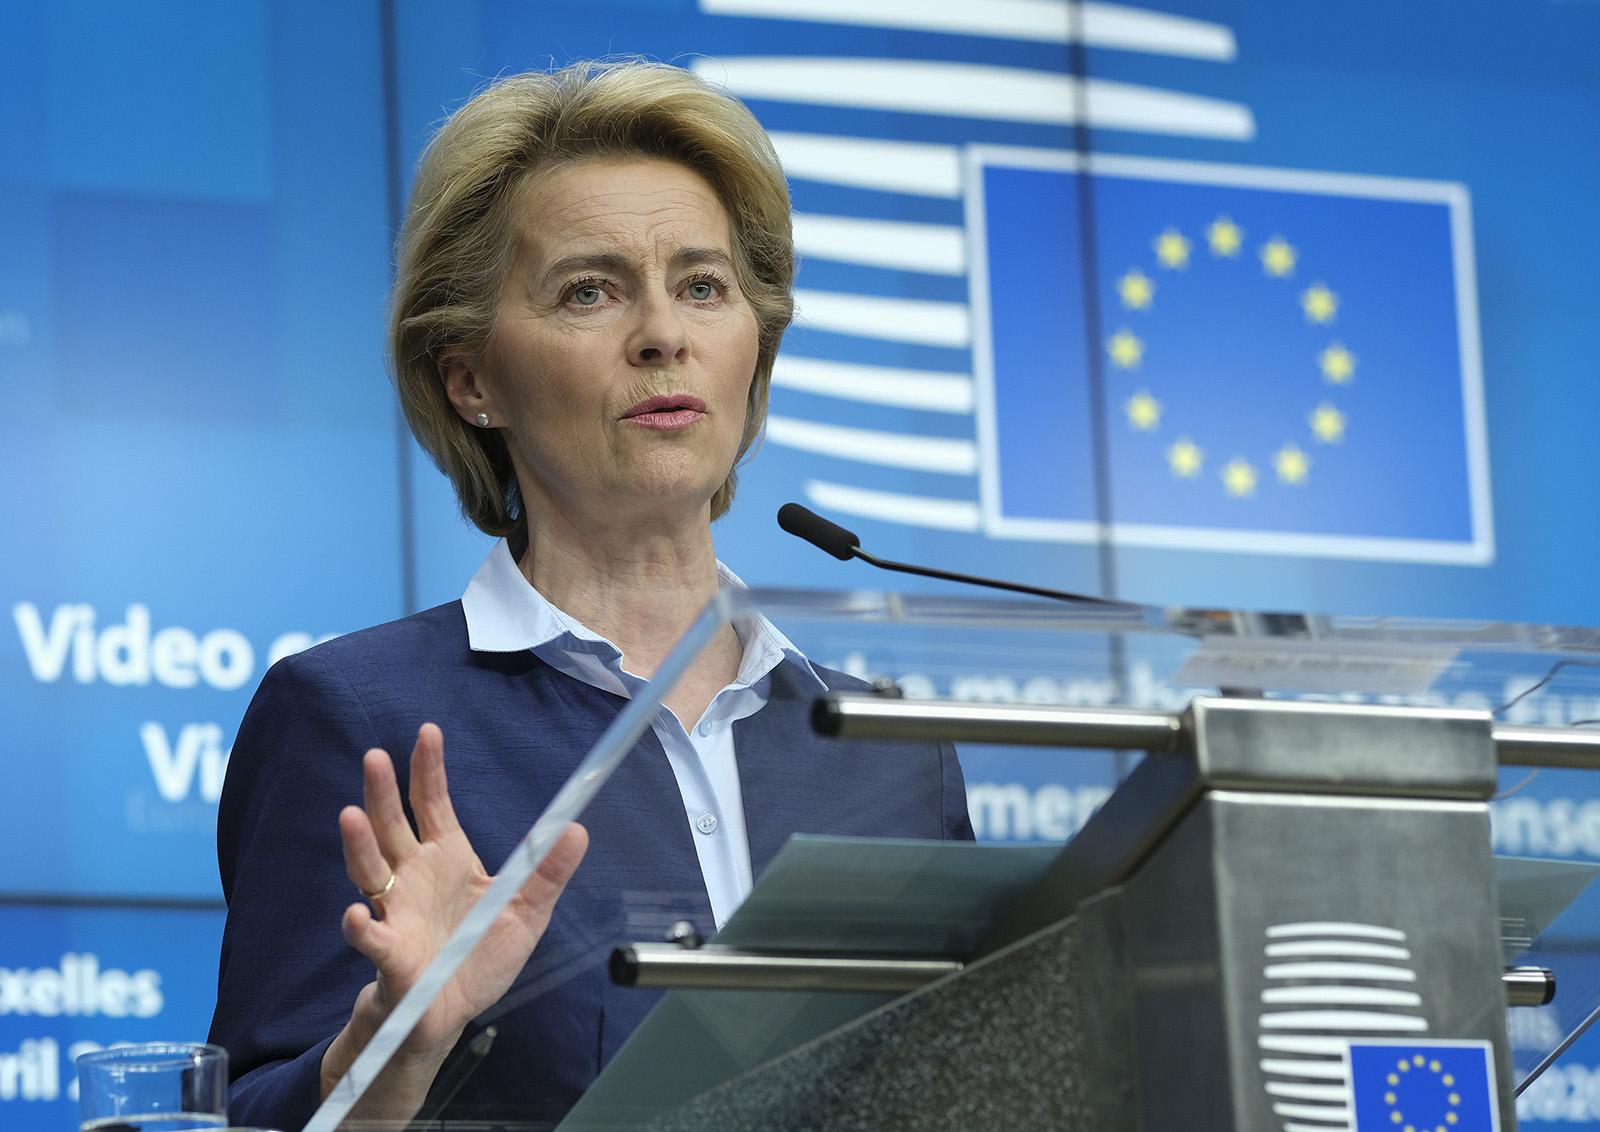 European Commission President Ursula von der Leyen speaks during a news conference in Brussels, Belgium, on April 23.